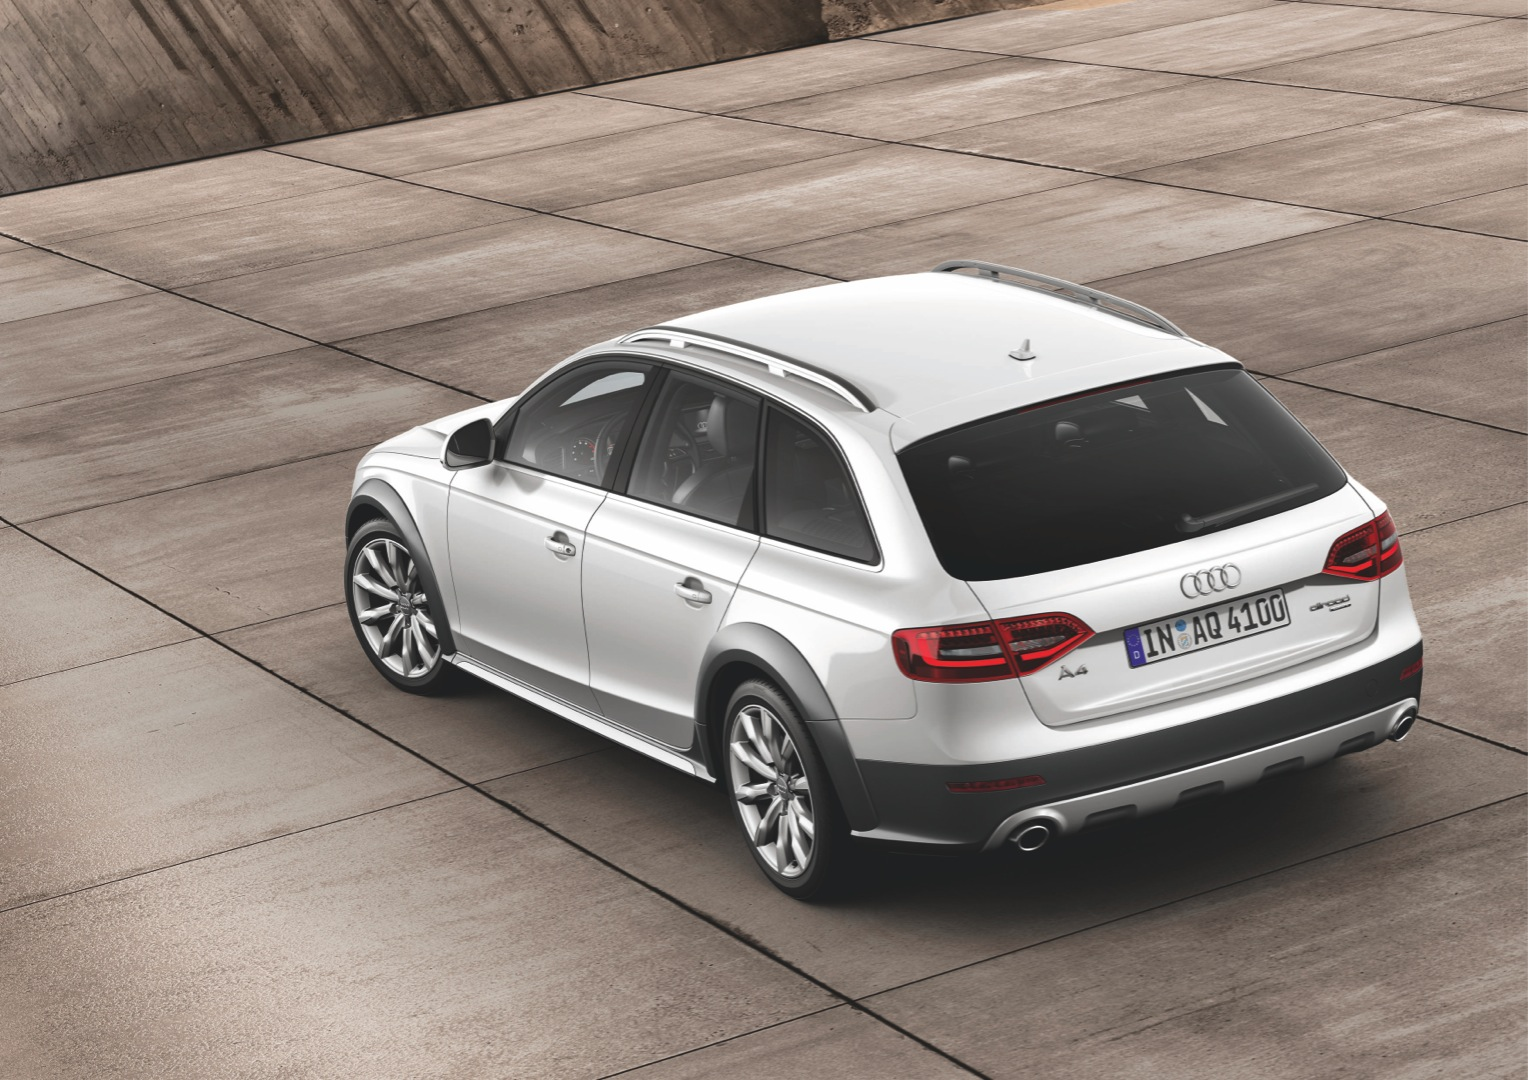 Audi A4 Allroad Specs Photos 2012 2013 2014 2015 2016 Autoevolution